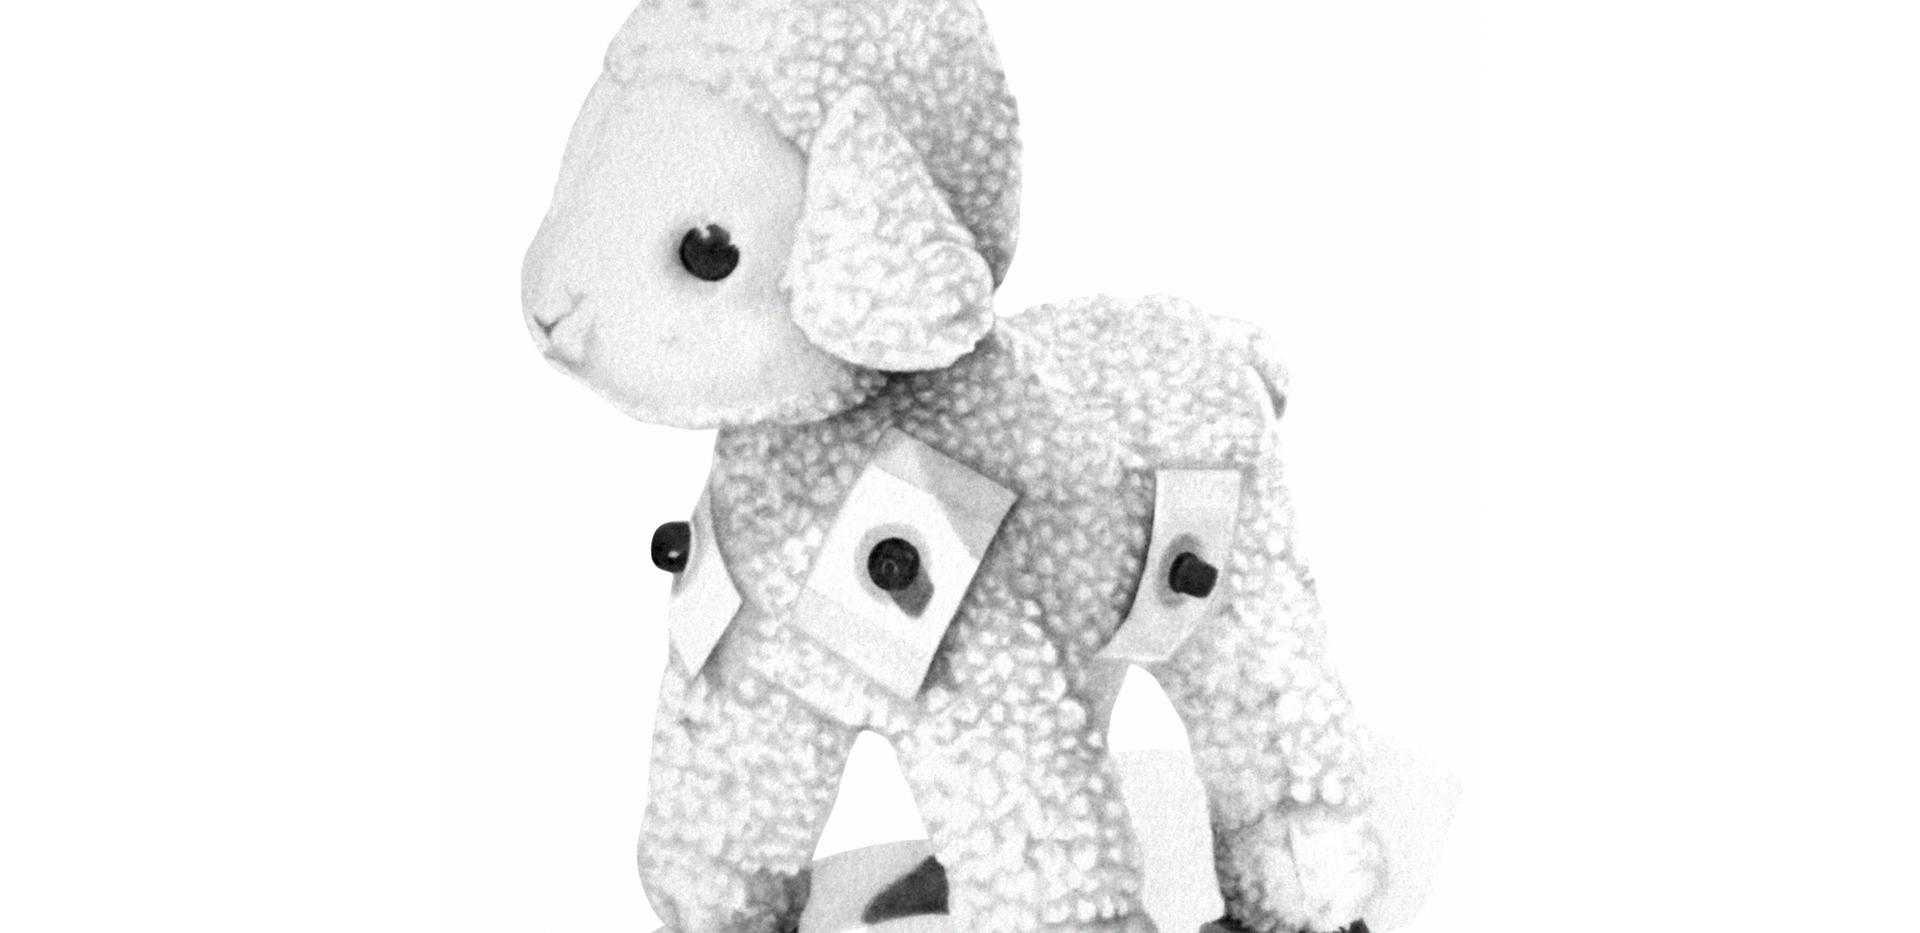 Mouton (Électrocardiogramme)